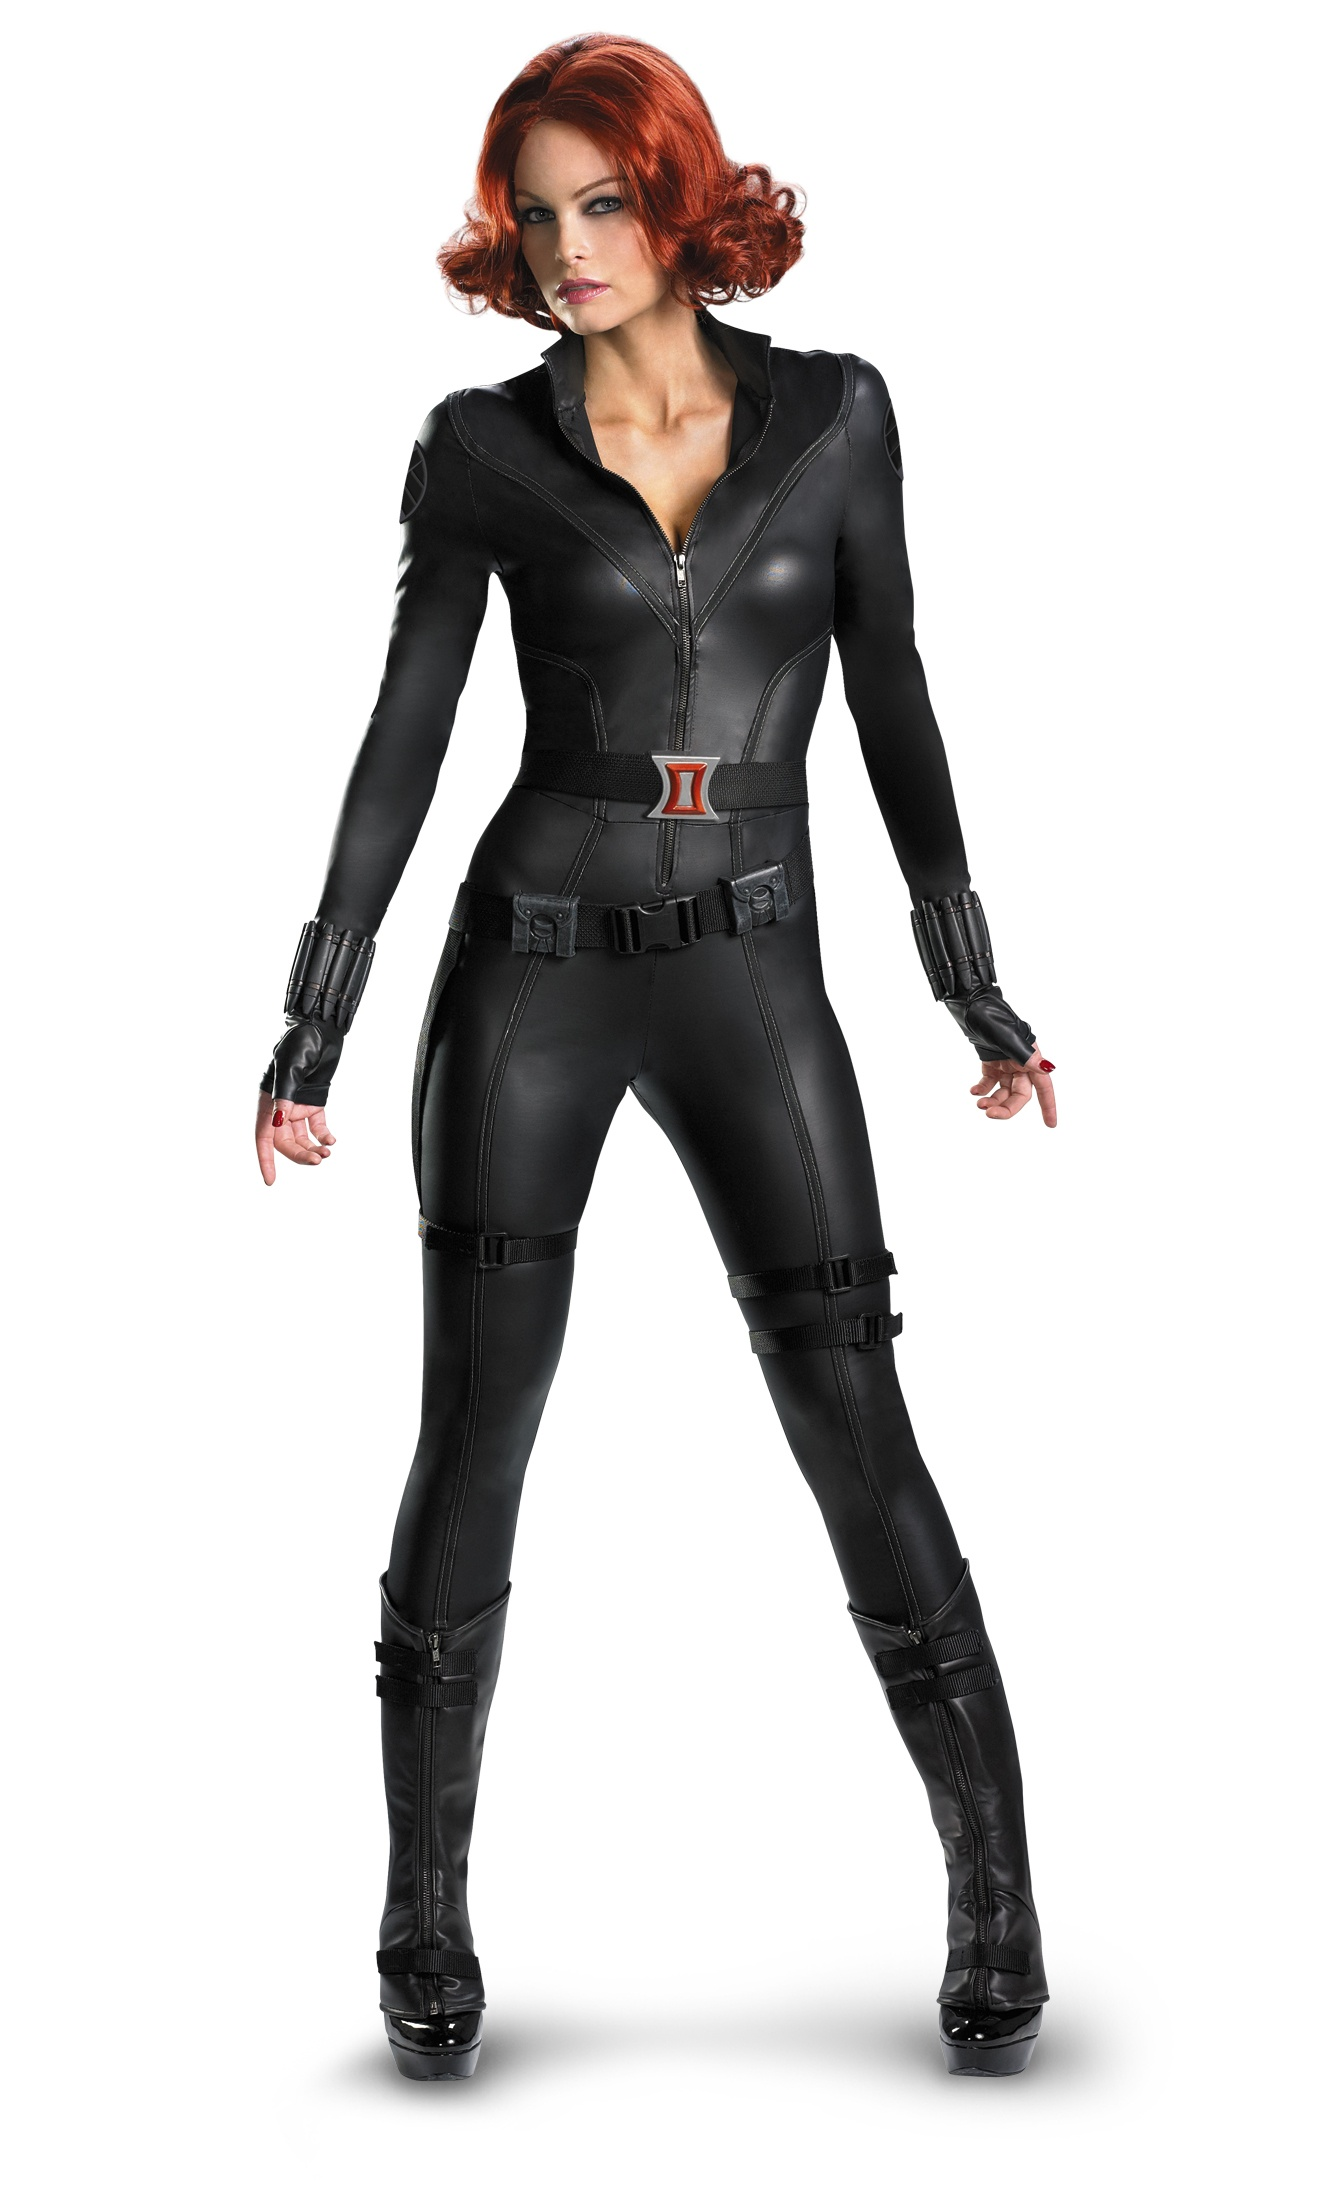 avengers black widow elite adult costume women. Black Bedroom Furniture Sets. Home Design Ideas